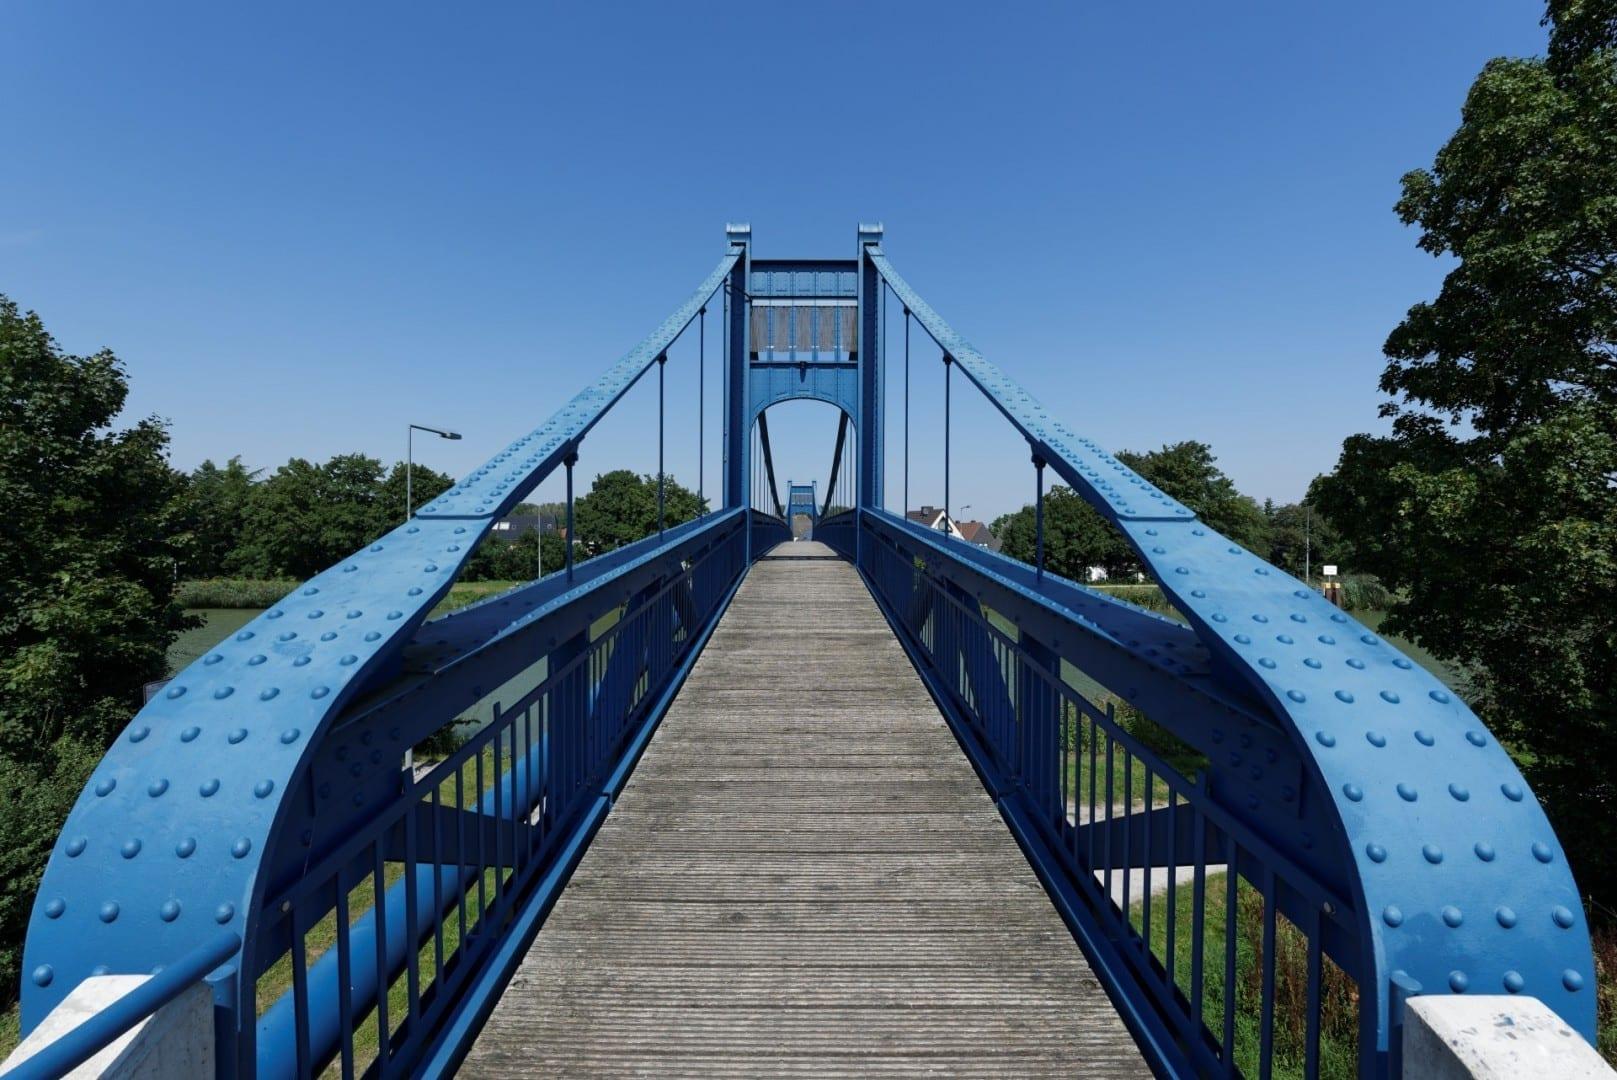 Puente peatonal Hamm Alemania